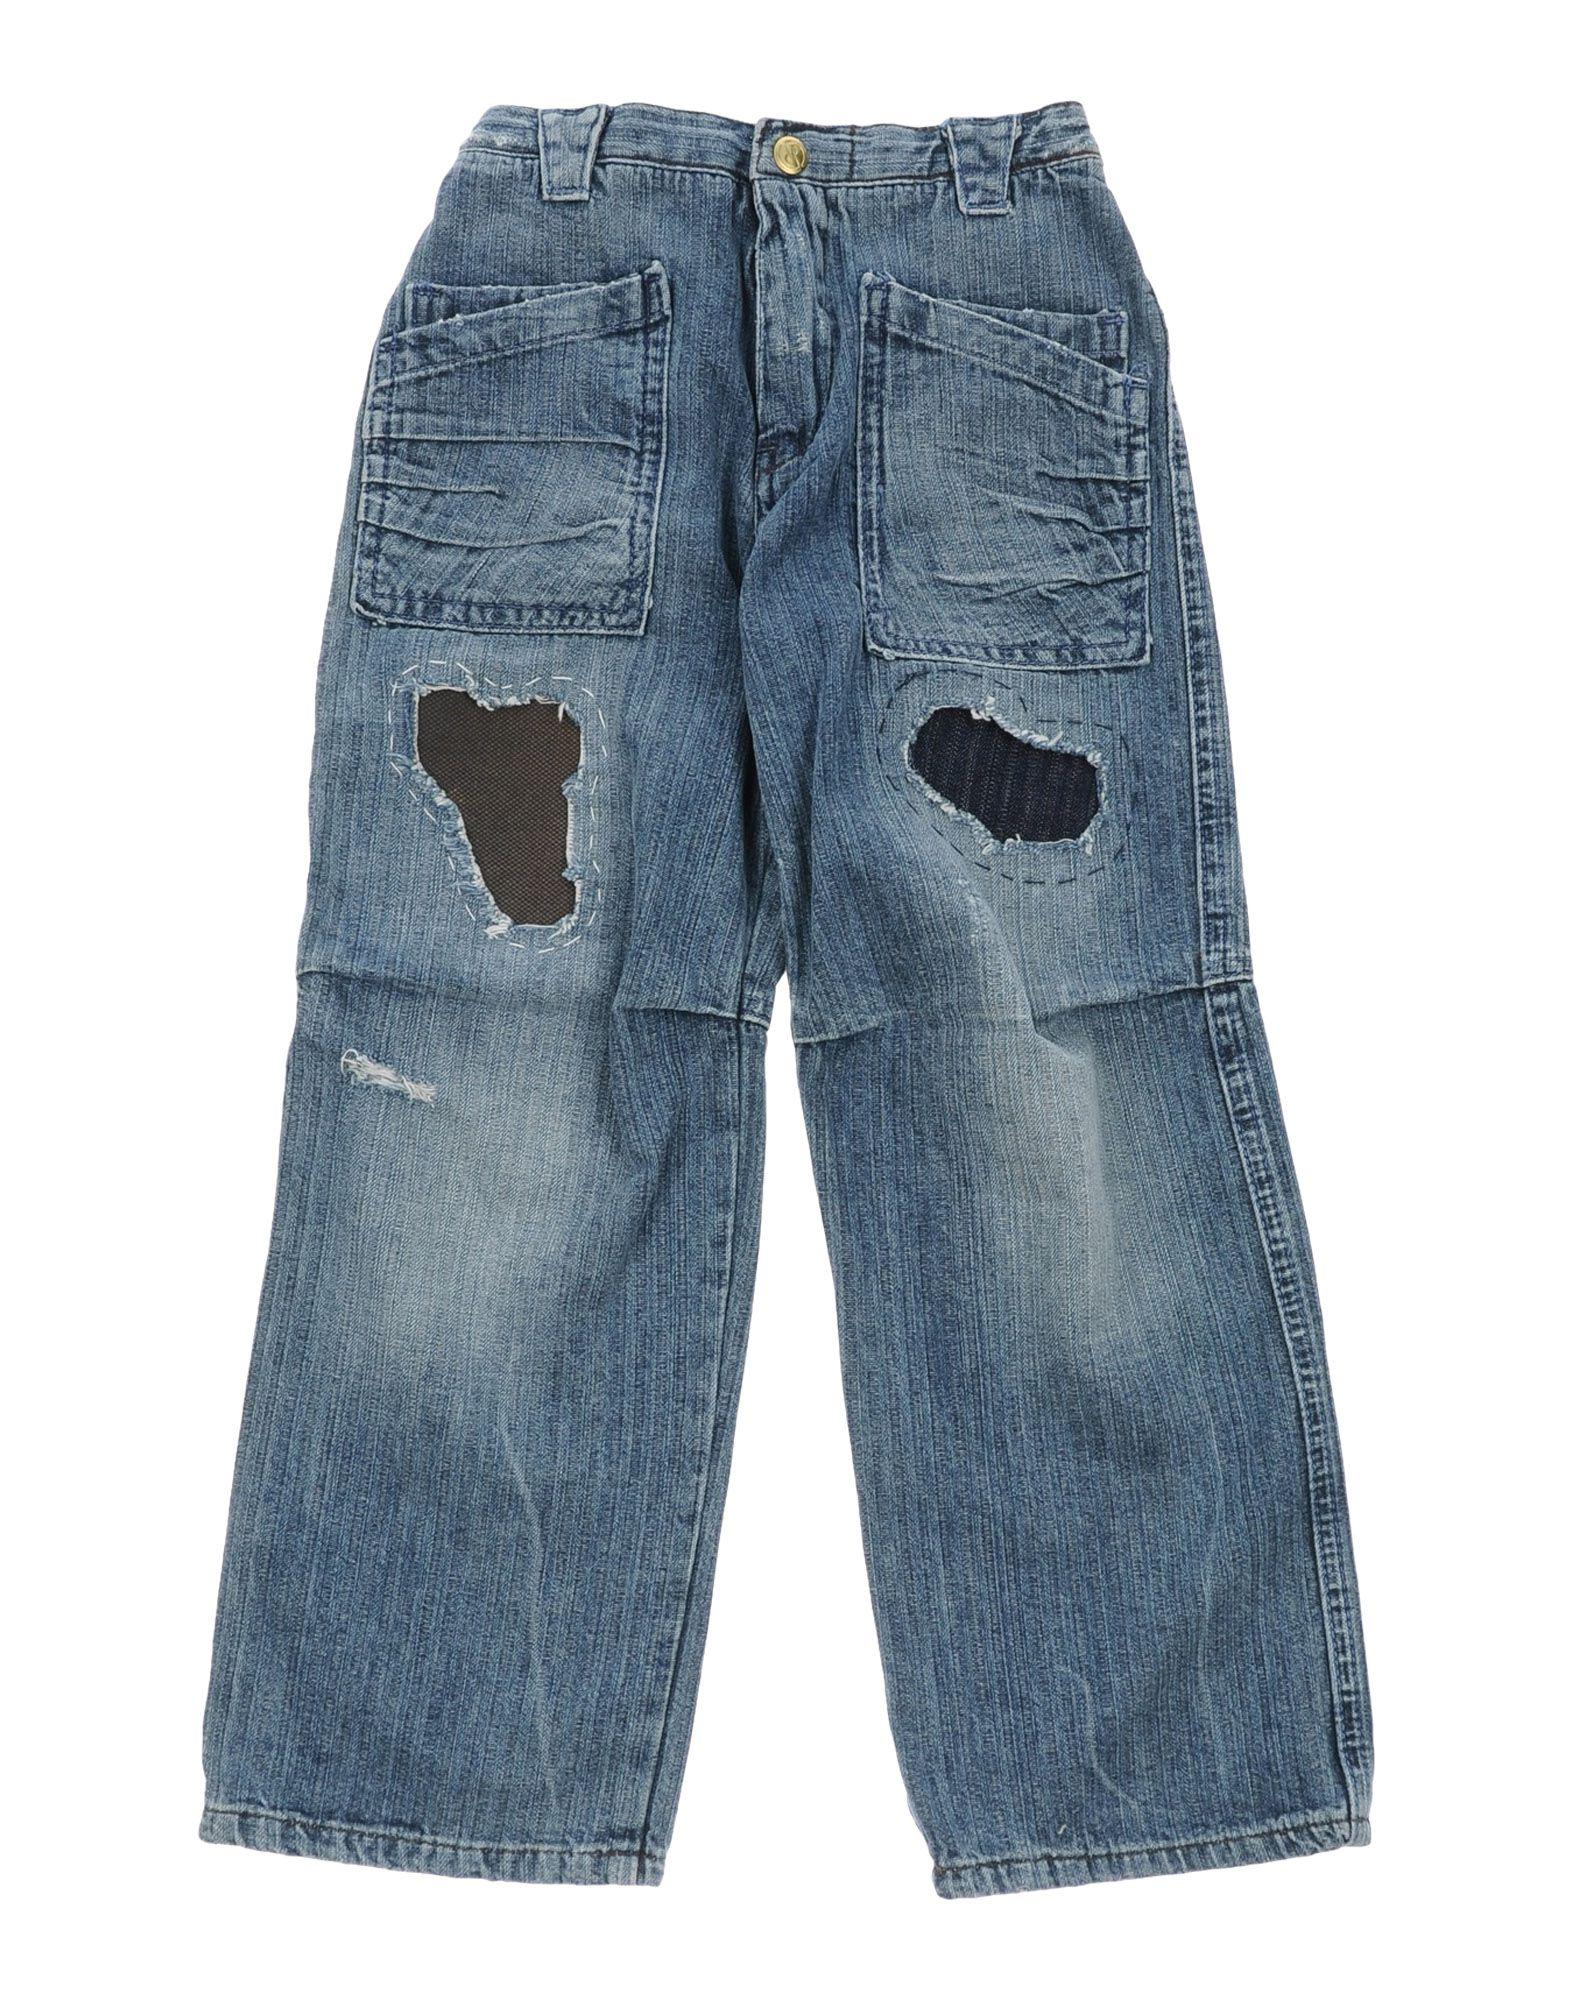 RA-RE THE KID Джинсовые брюки original roland re 640 ra 640 print carriage board w701987010